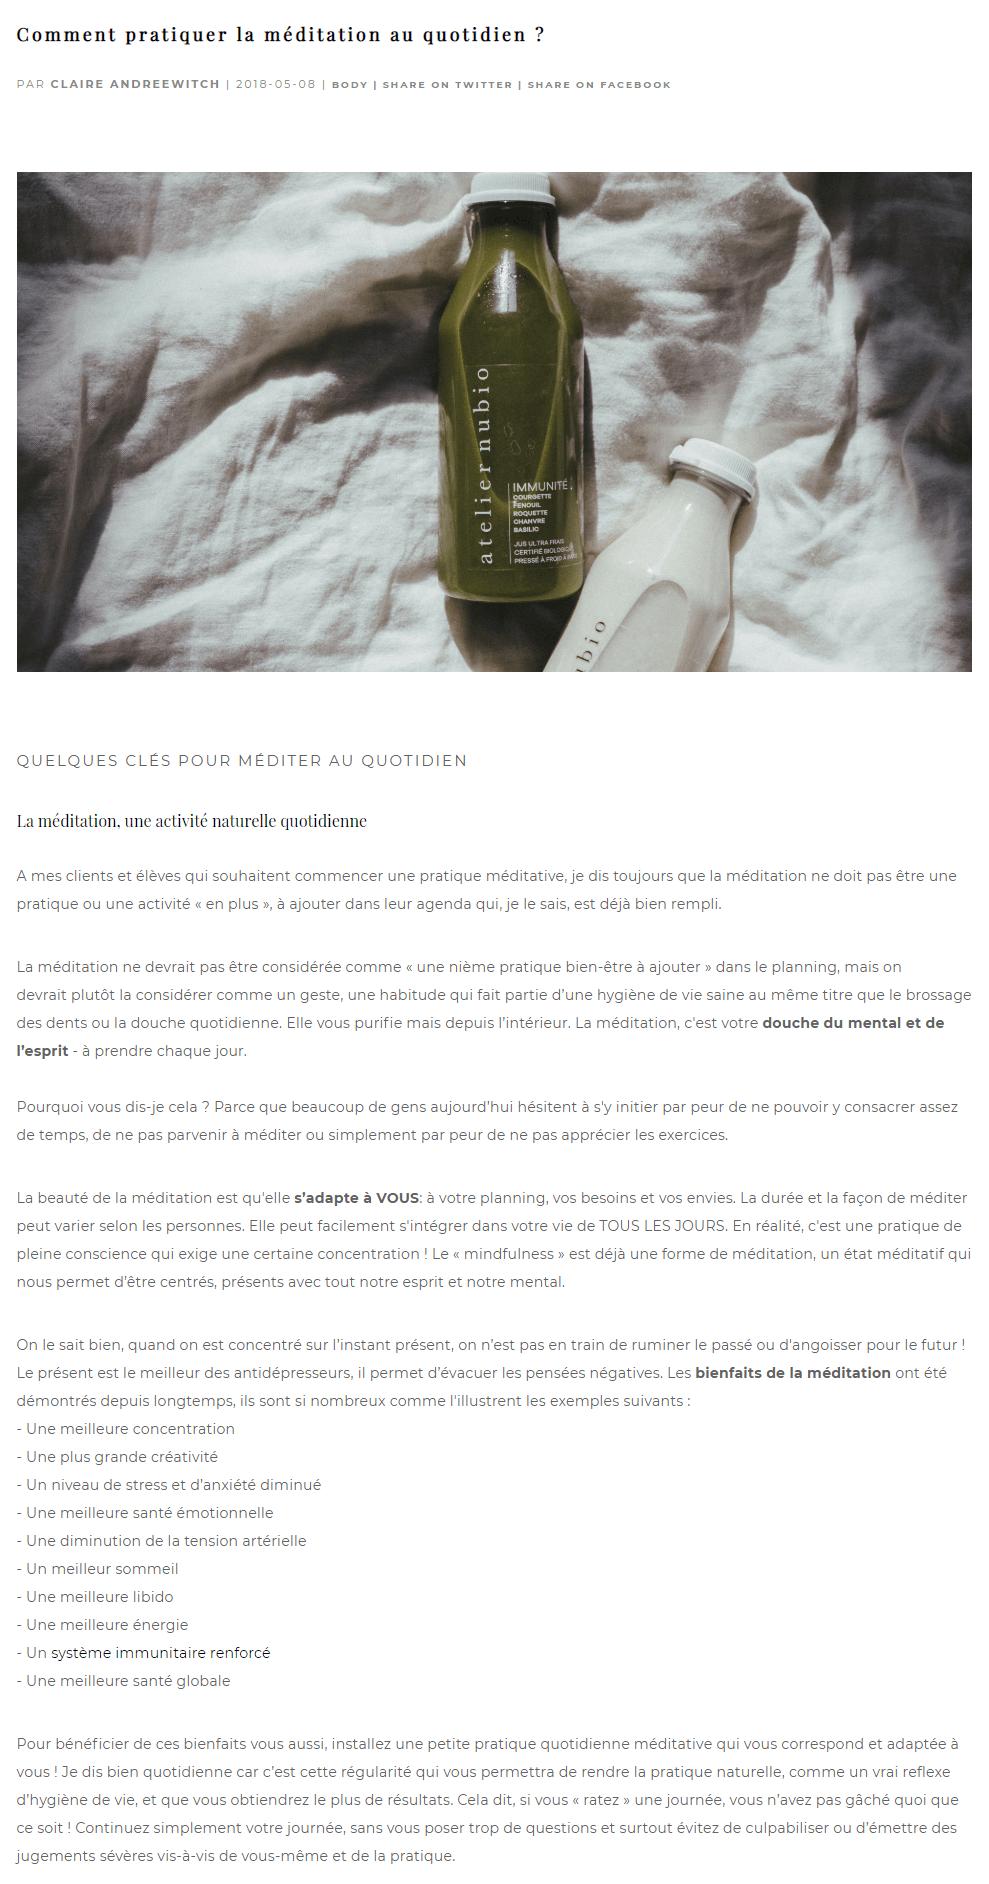 ateliernubio.fr mai 2018